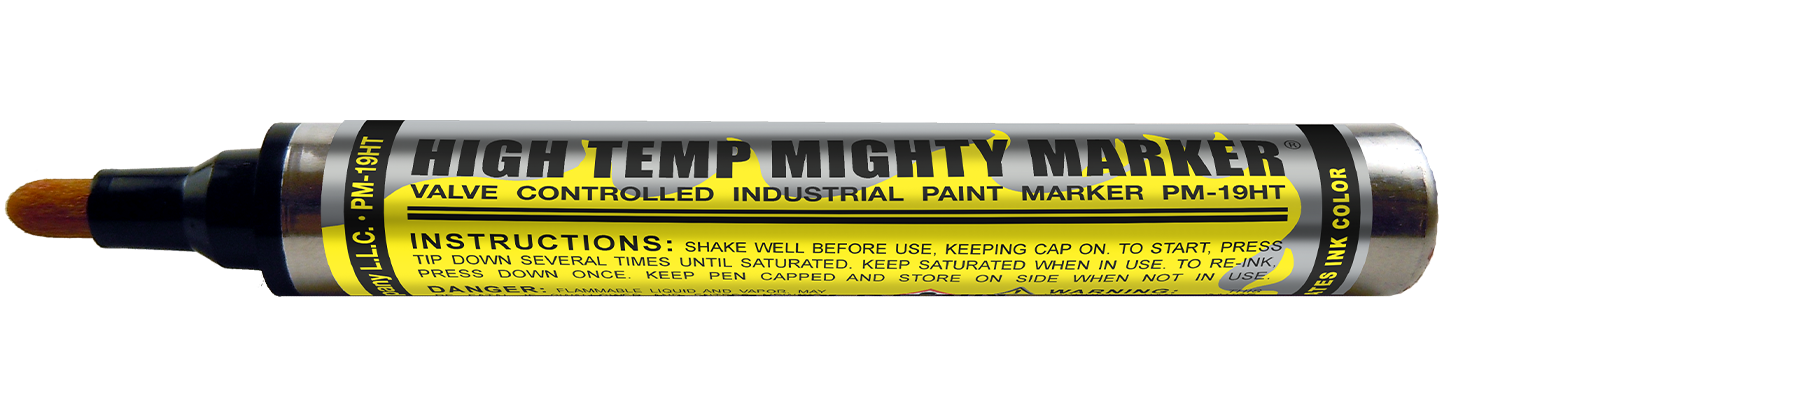 Mighty Marker High Temp